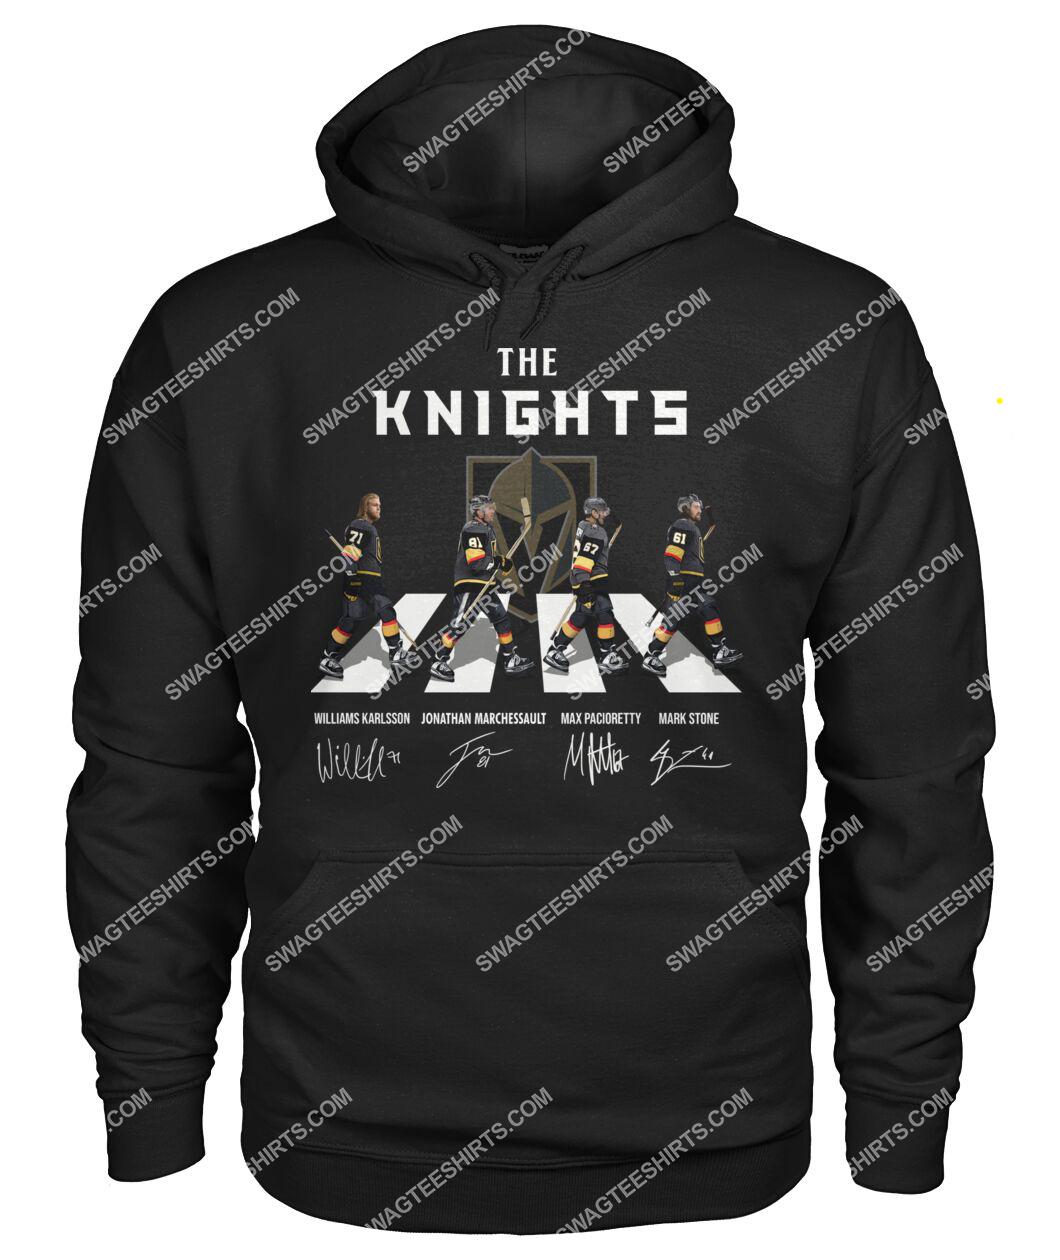 the vegas golden knights walking abbey road hoodie 1